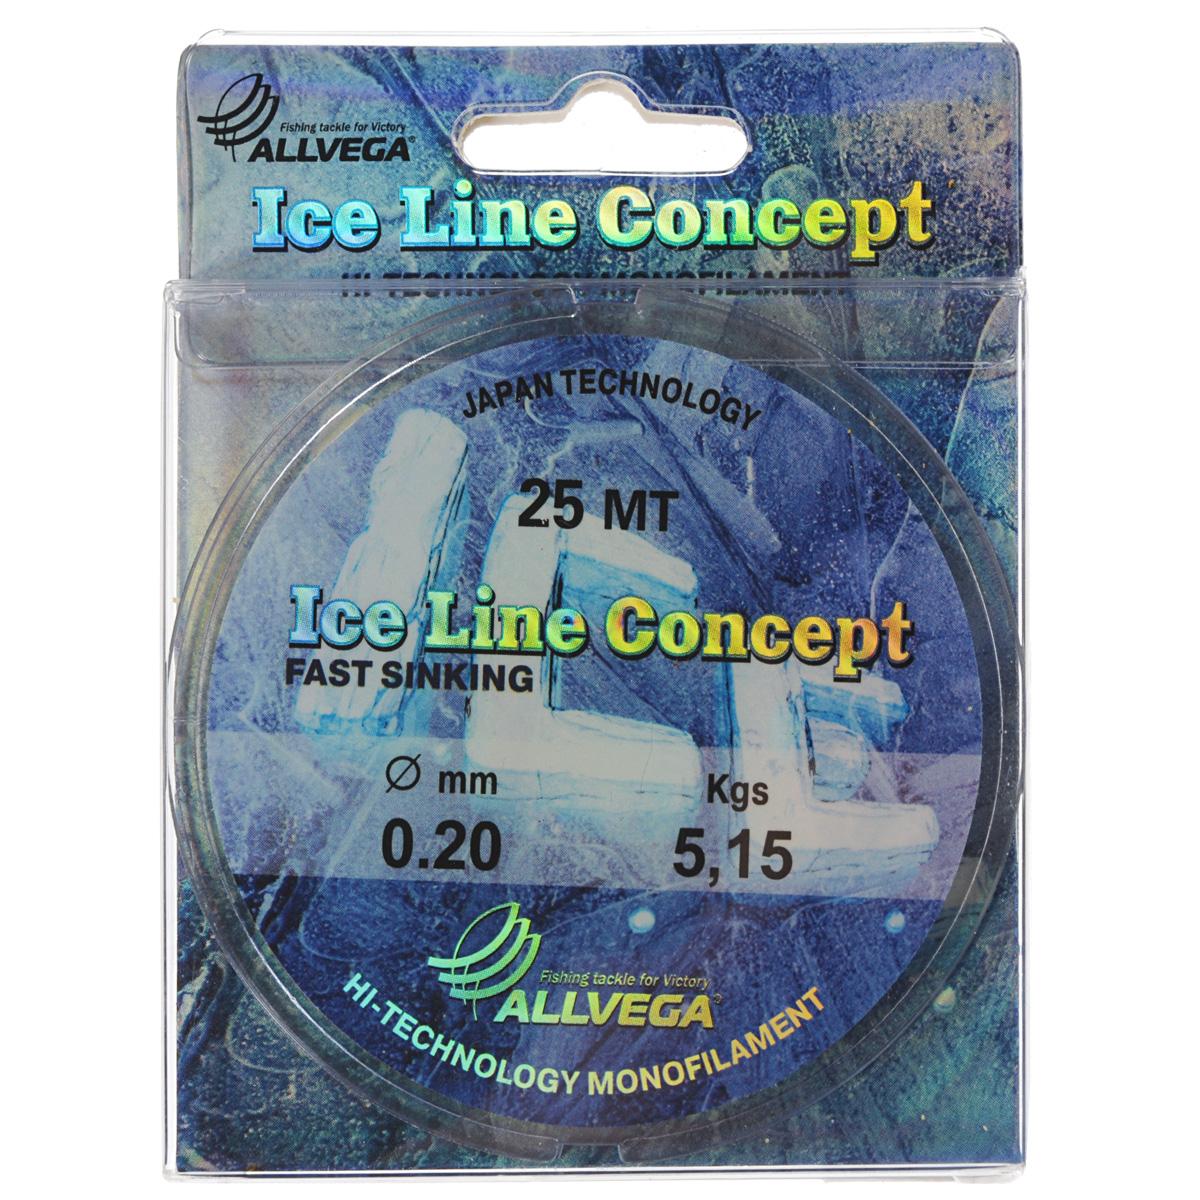 Леска Allvega Ice Line Concept, сечение 0,2 мм, длина 25 м удочка зимняя swd ice action 55 см